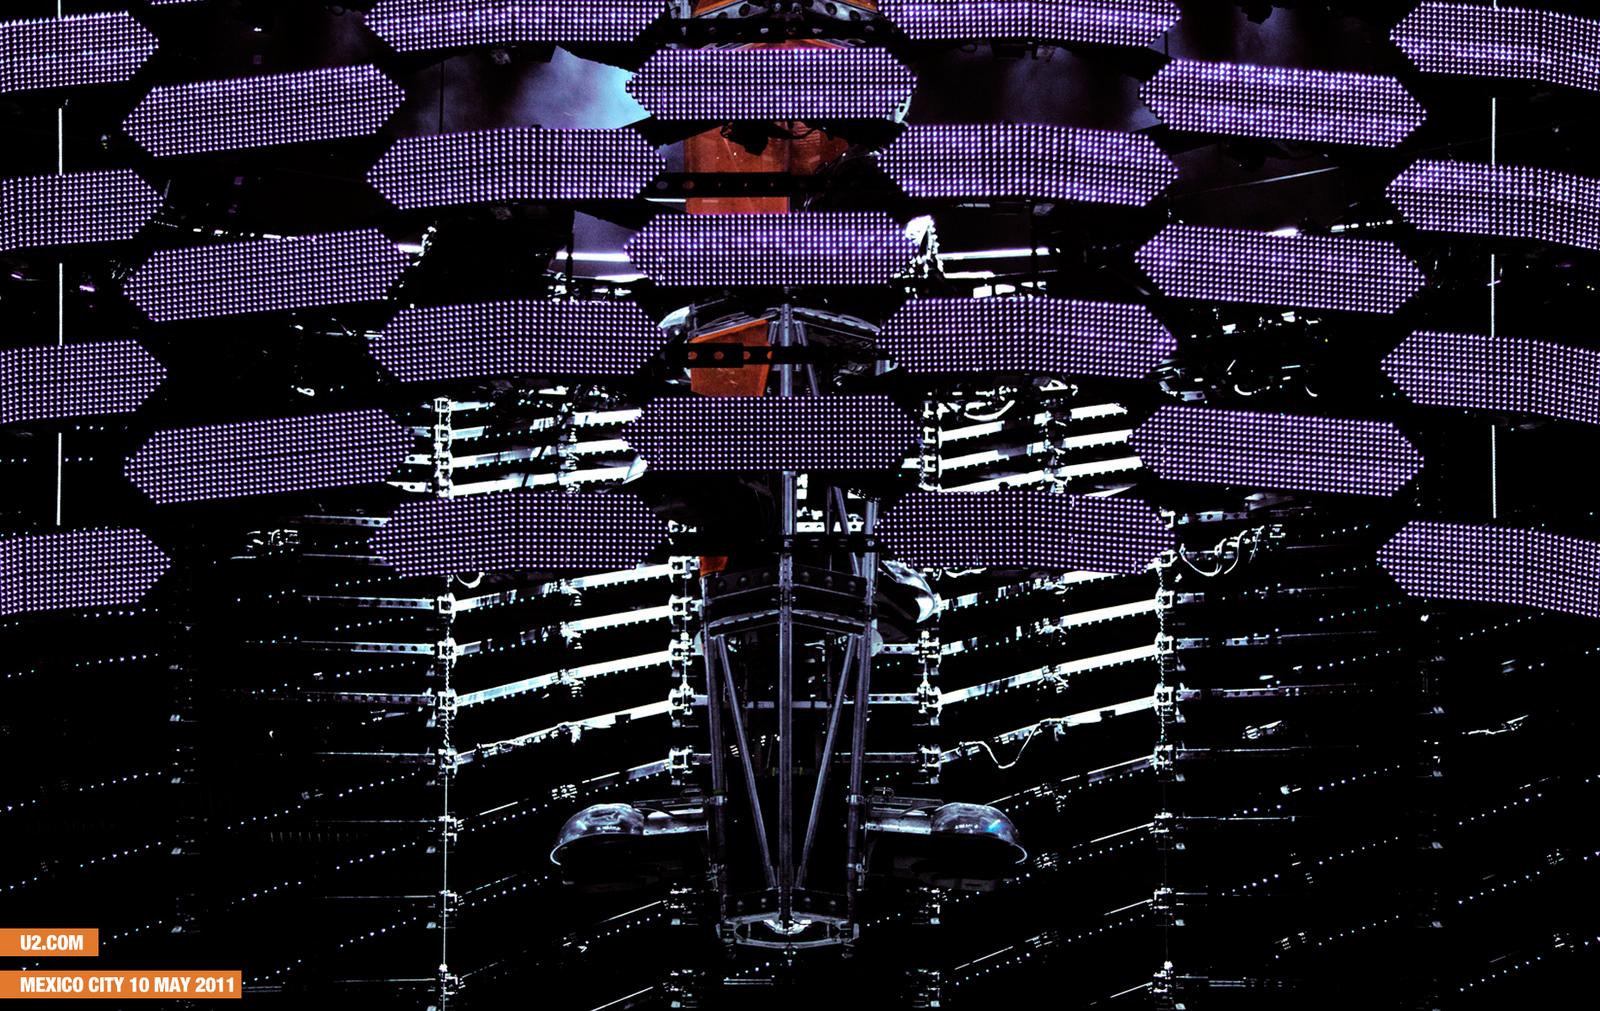 u2 kiss the future - photo #34